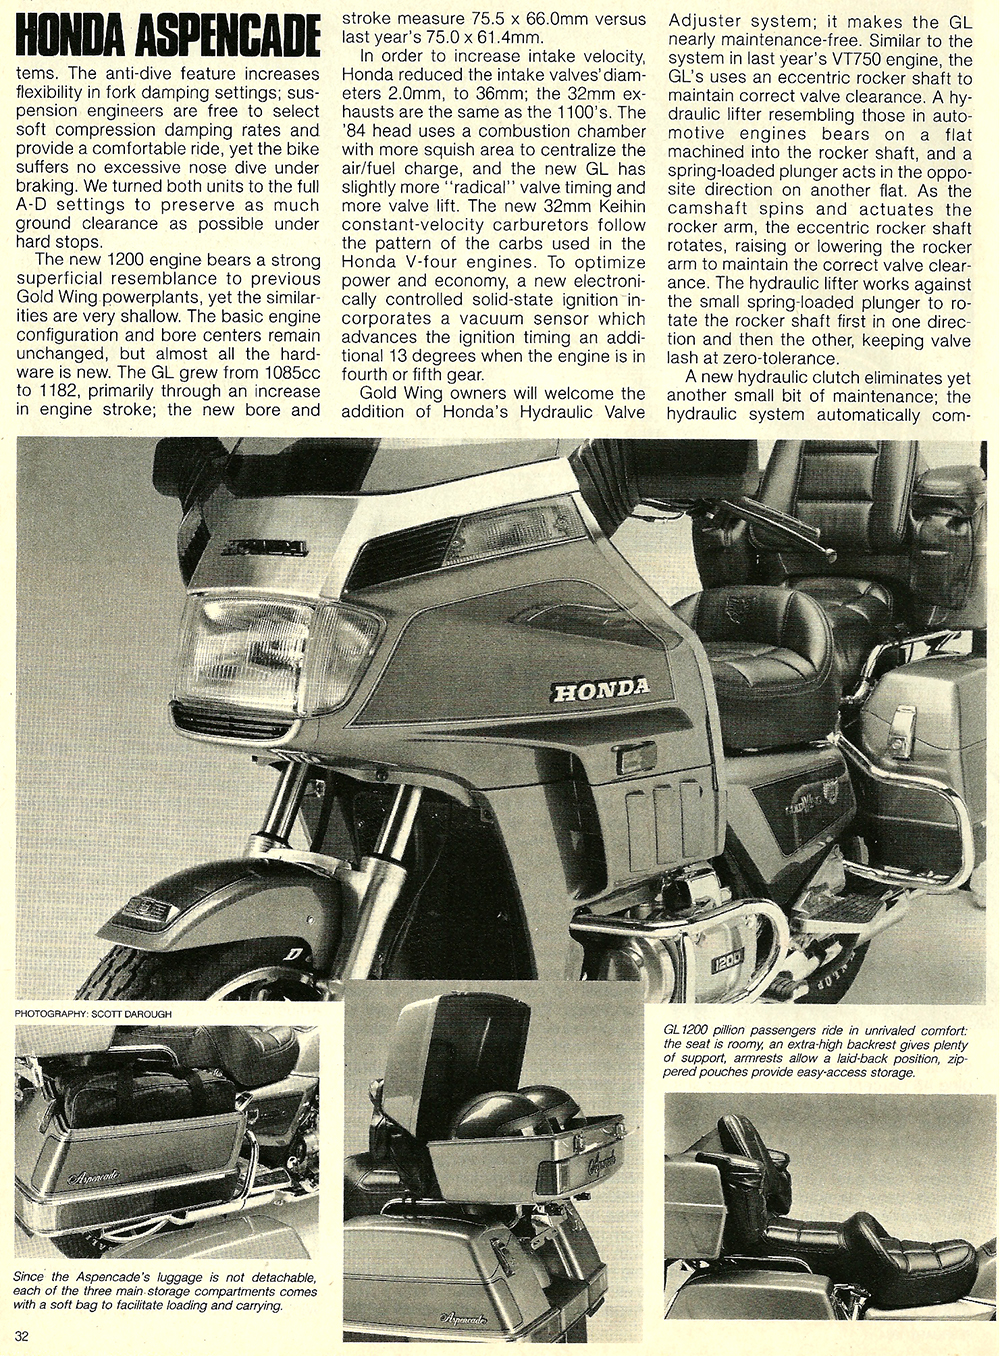 1984 Honda GL1200A Gold Wing Aspencade road test 5.jpg